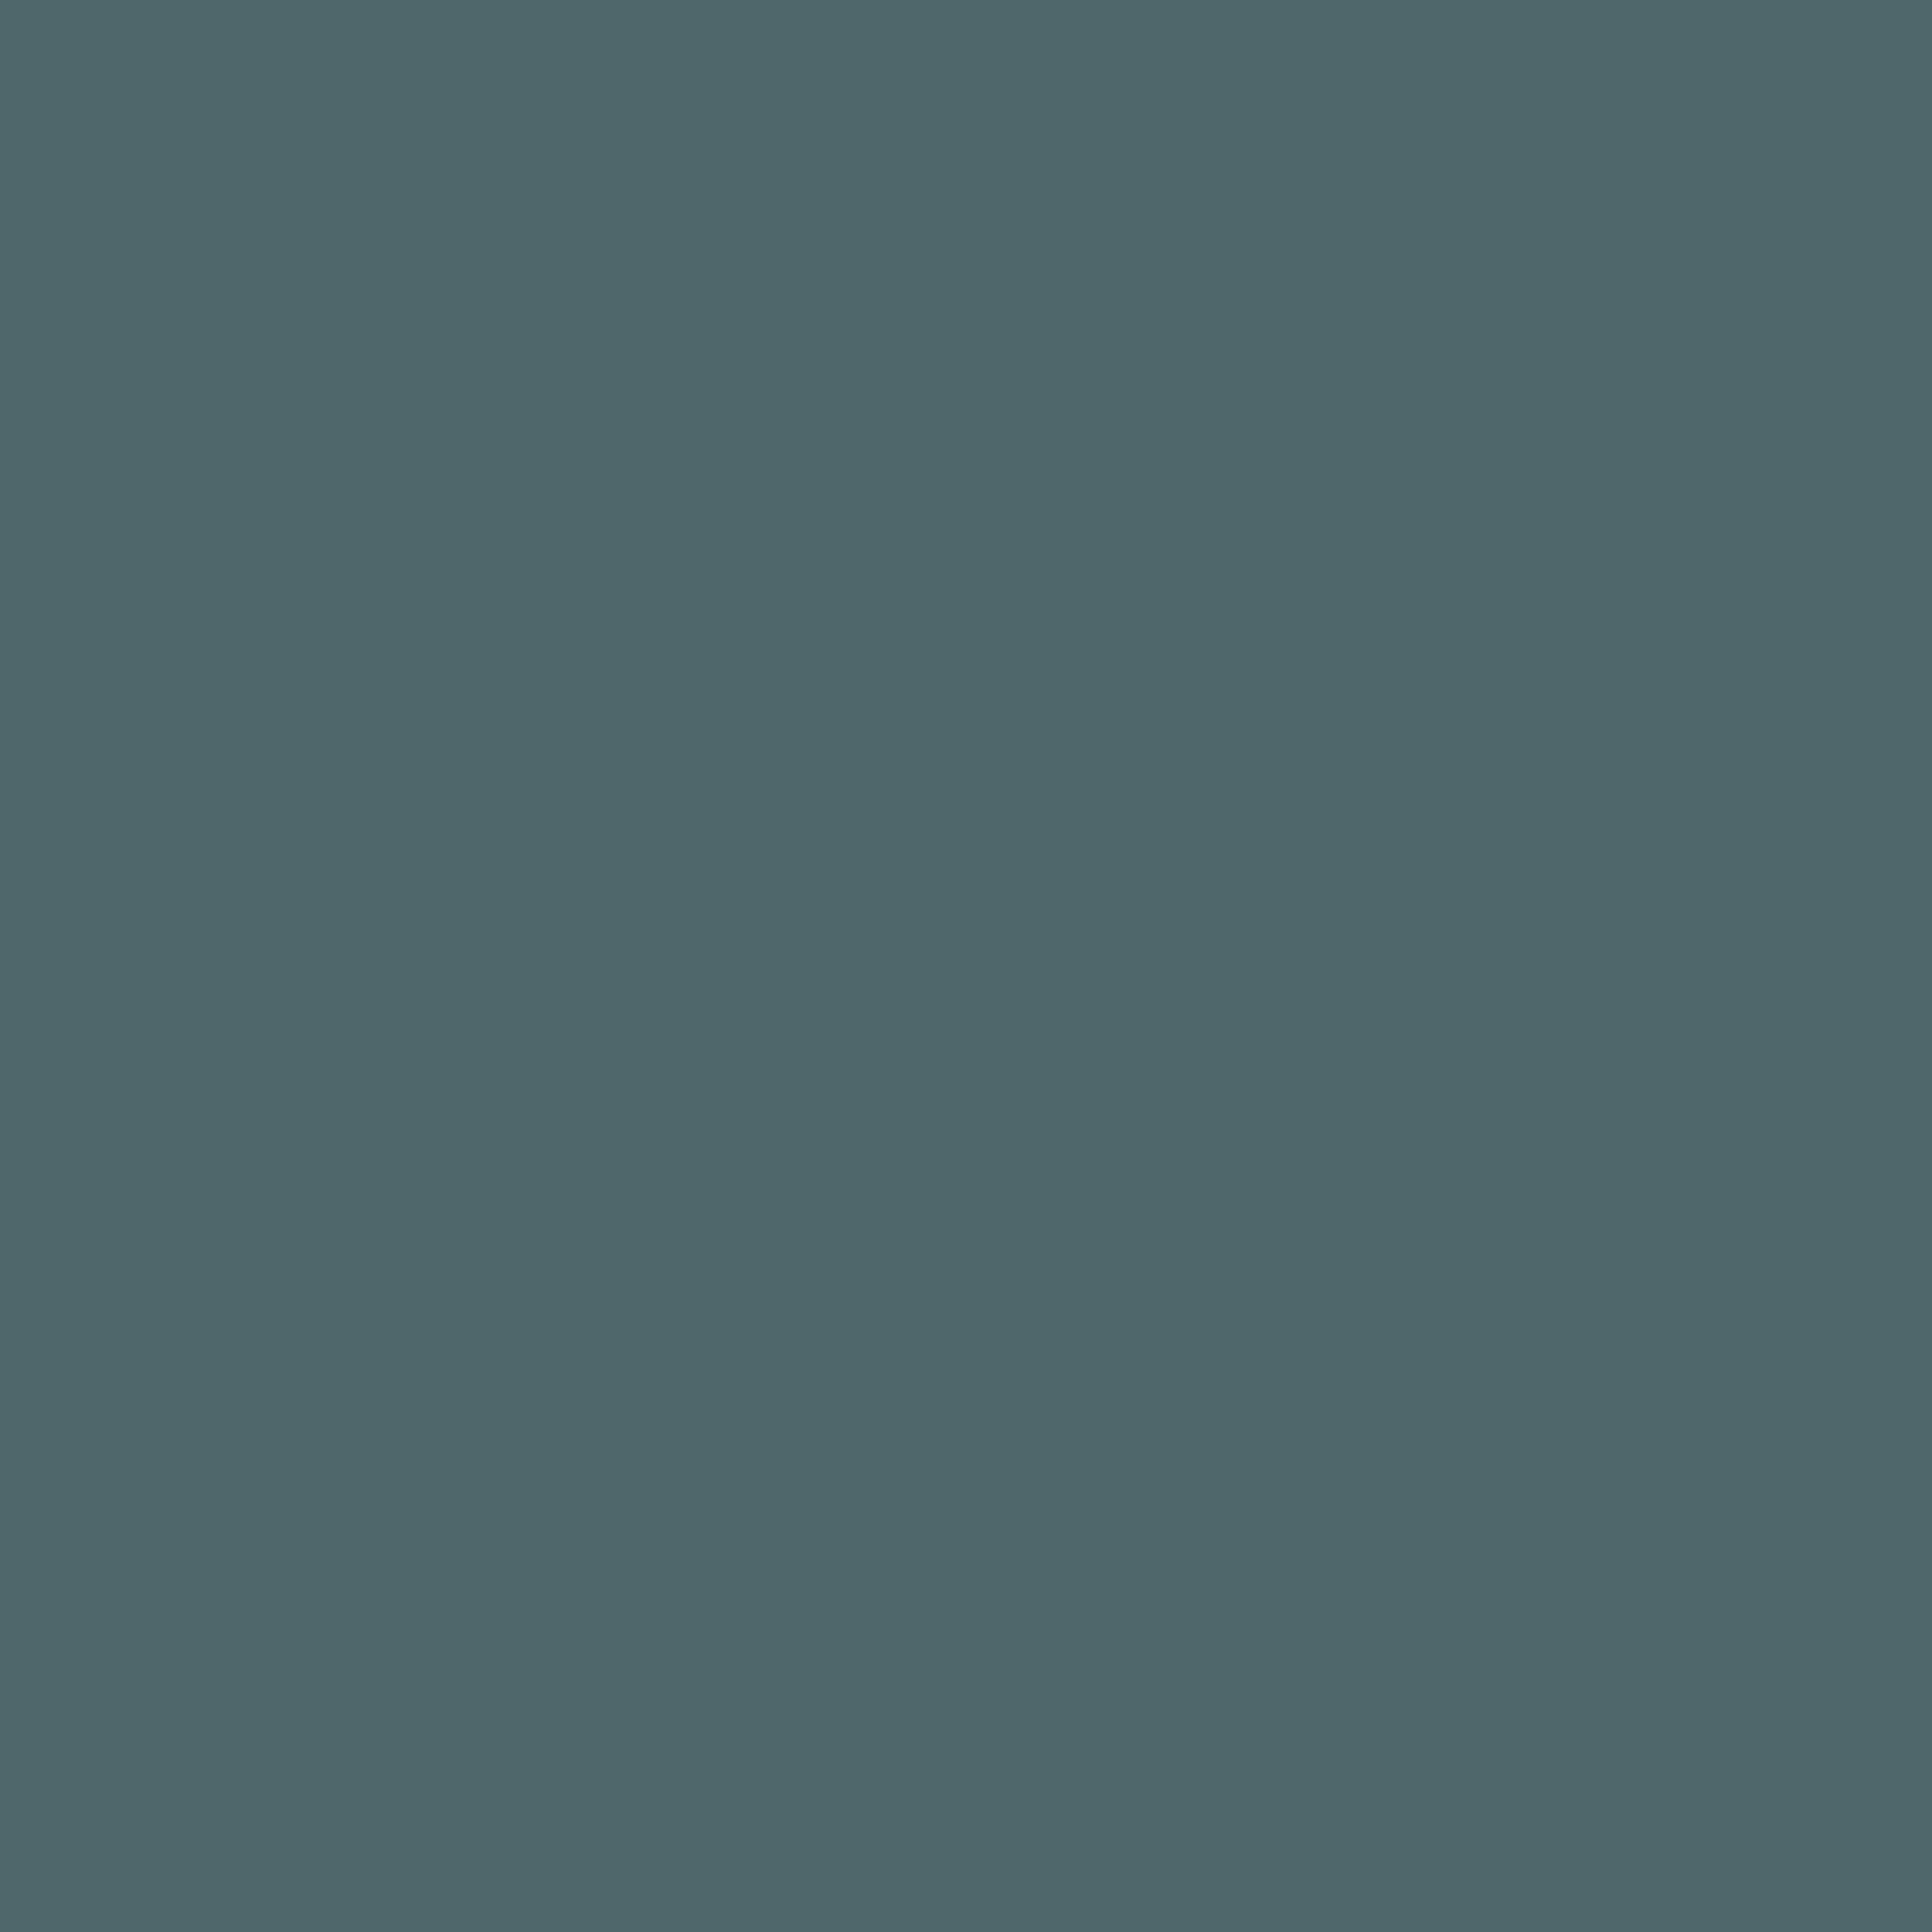 2732x2732 Stormcloud Solid Color Background